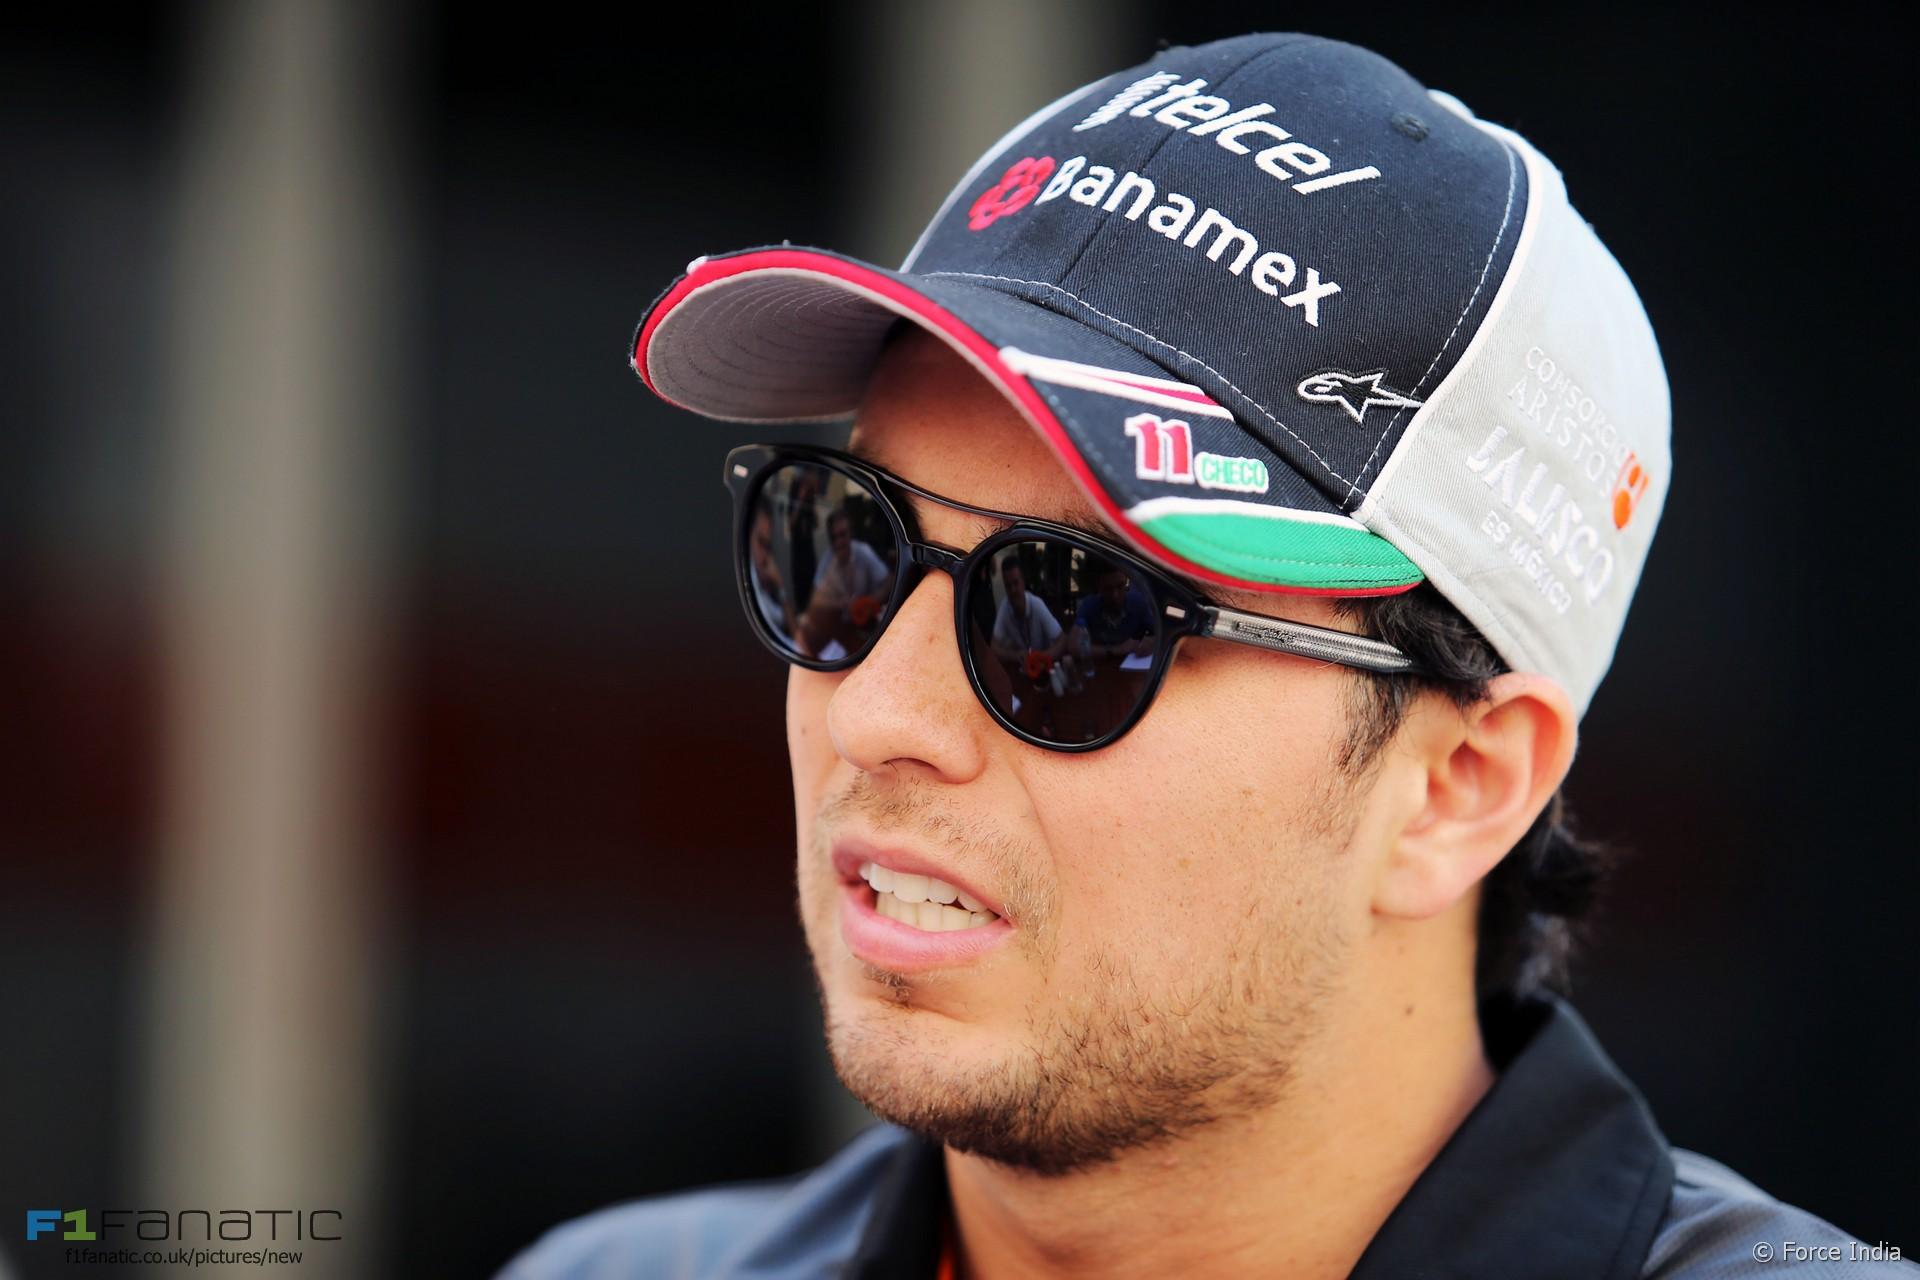 Sergio Perez, Force India, Yas Marina, 2015